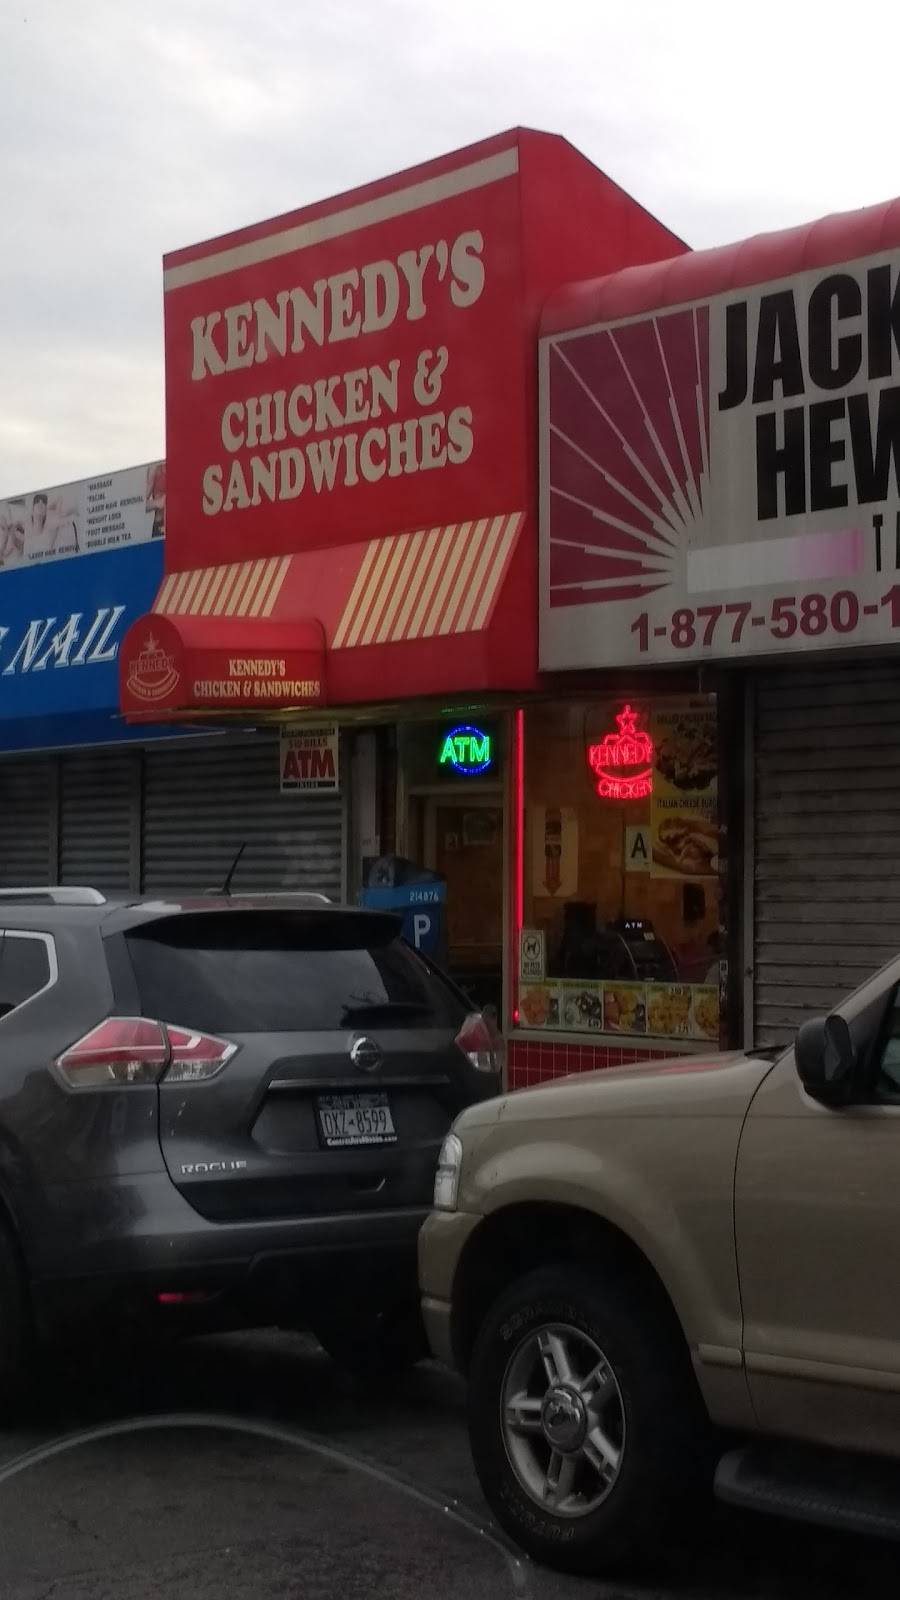 Kennedy Chicken & Sandwichs   restaurant   707 Lydig Ave, Bronx, NY 10462, USA   7188231341 OR +1 718-823-1341